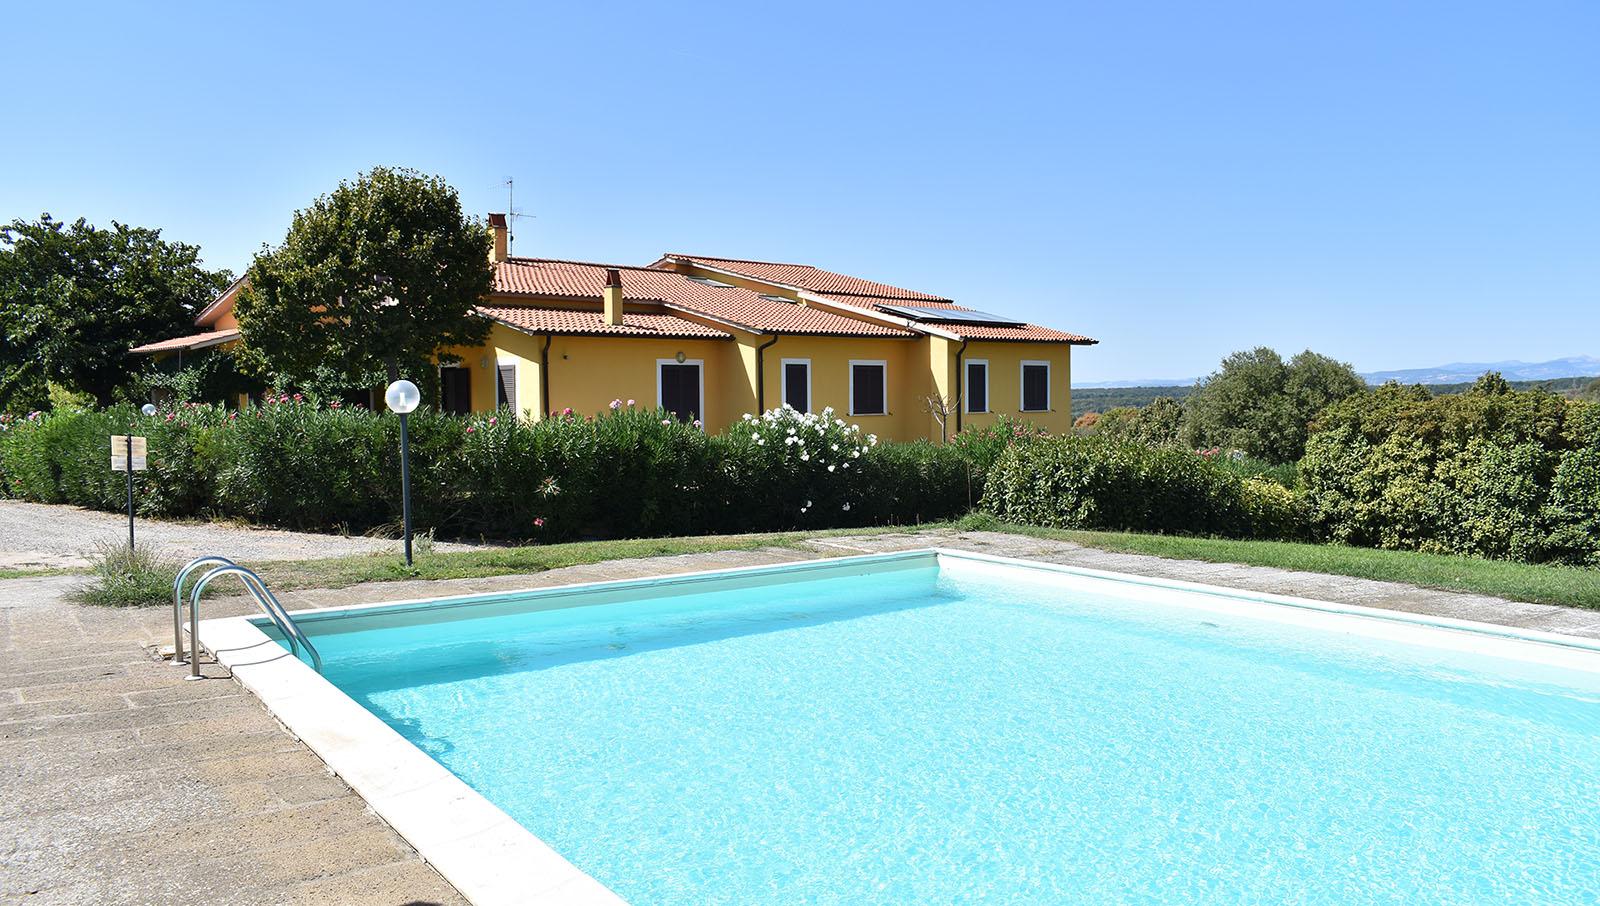 poggio_torreano_piscina